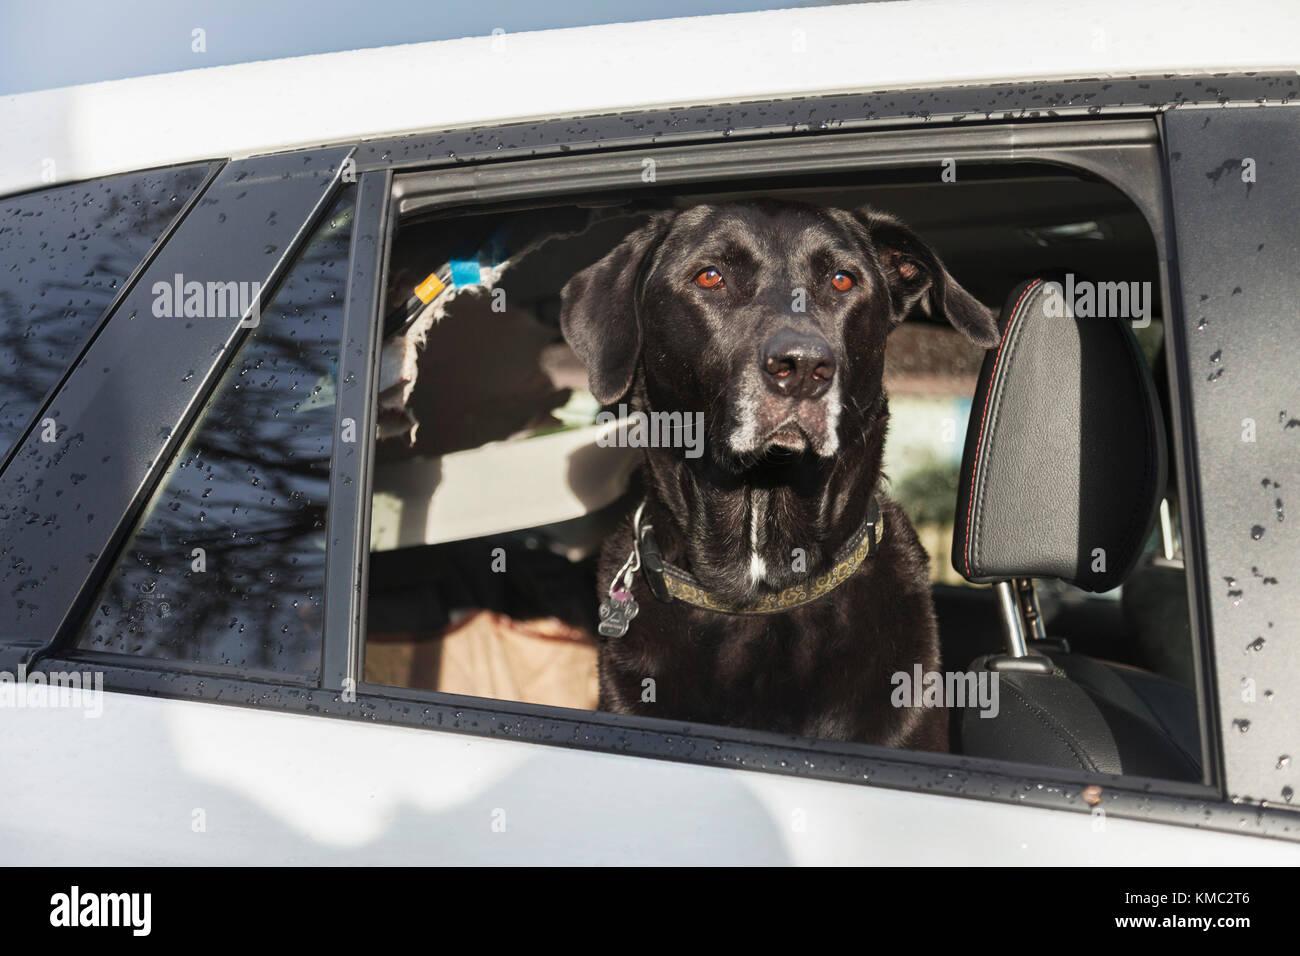 Black dog sitting calmly after destroying vehicle interior. - Stock Image